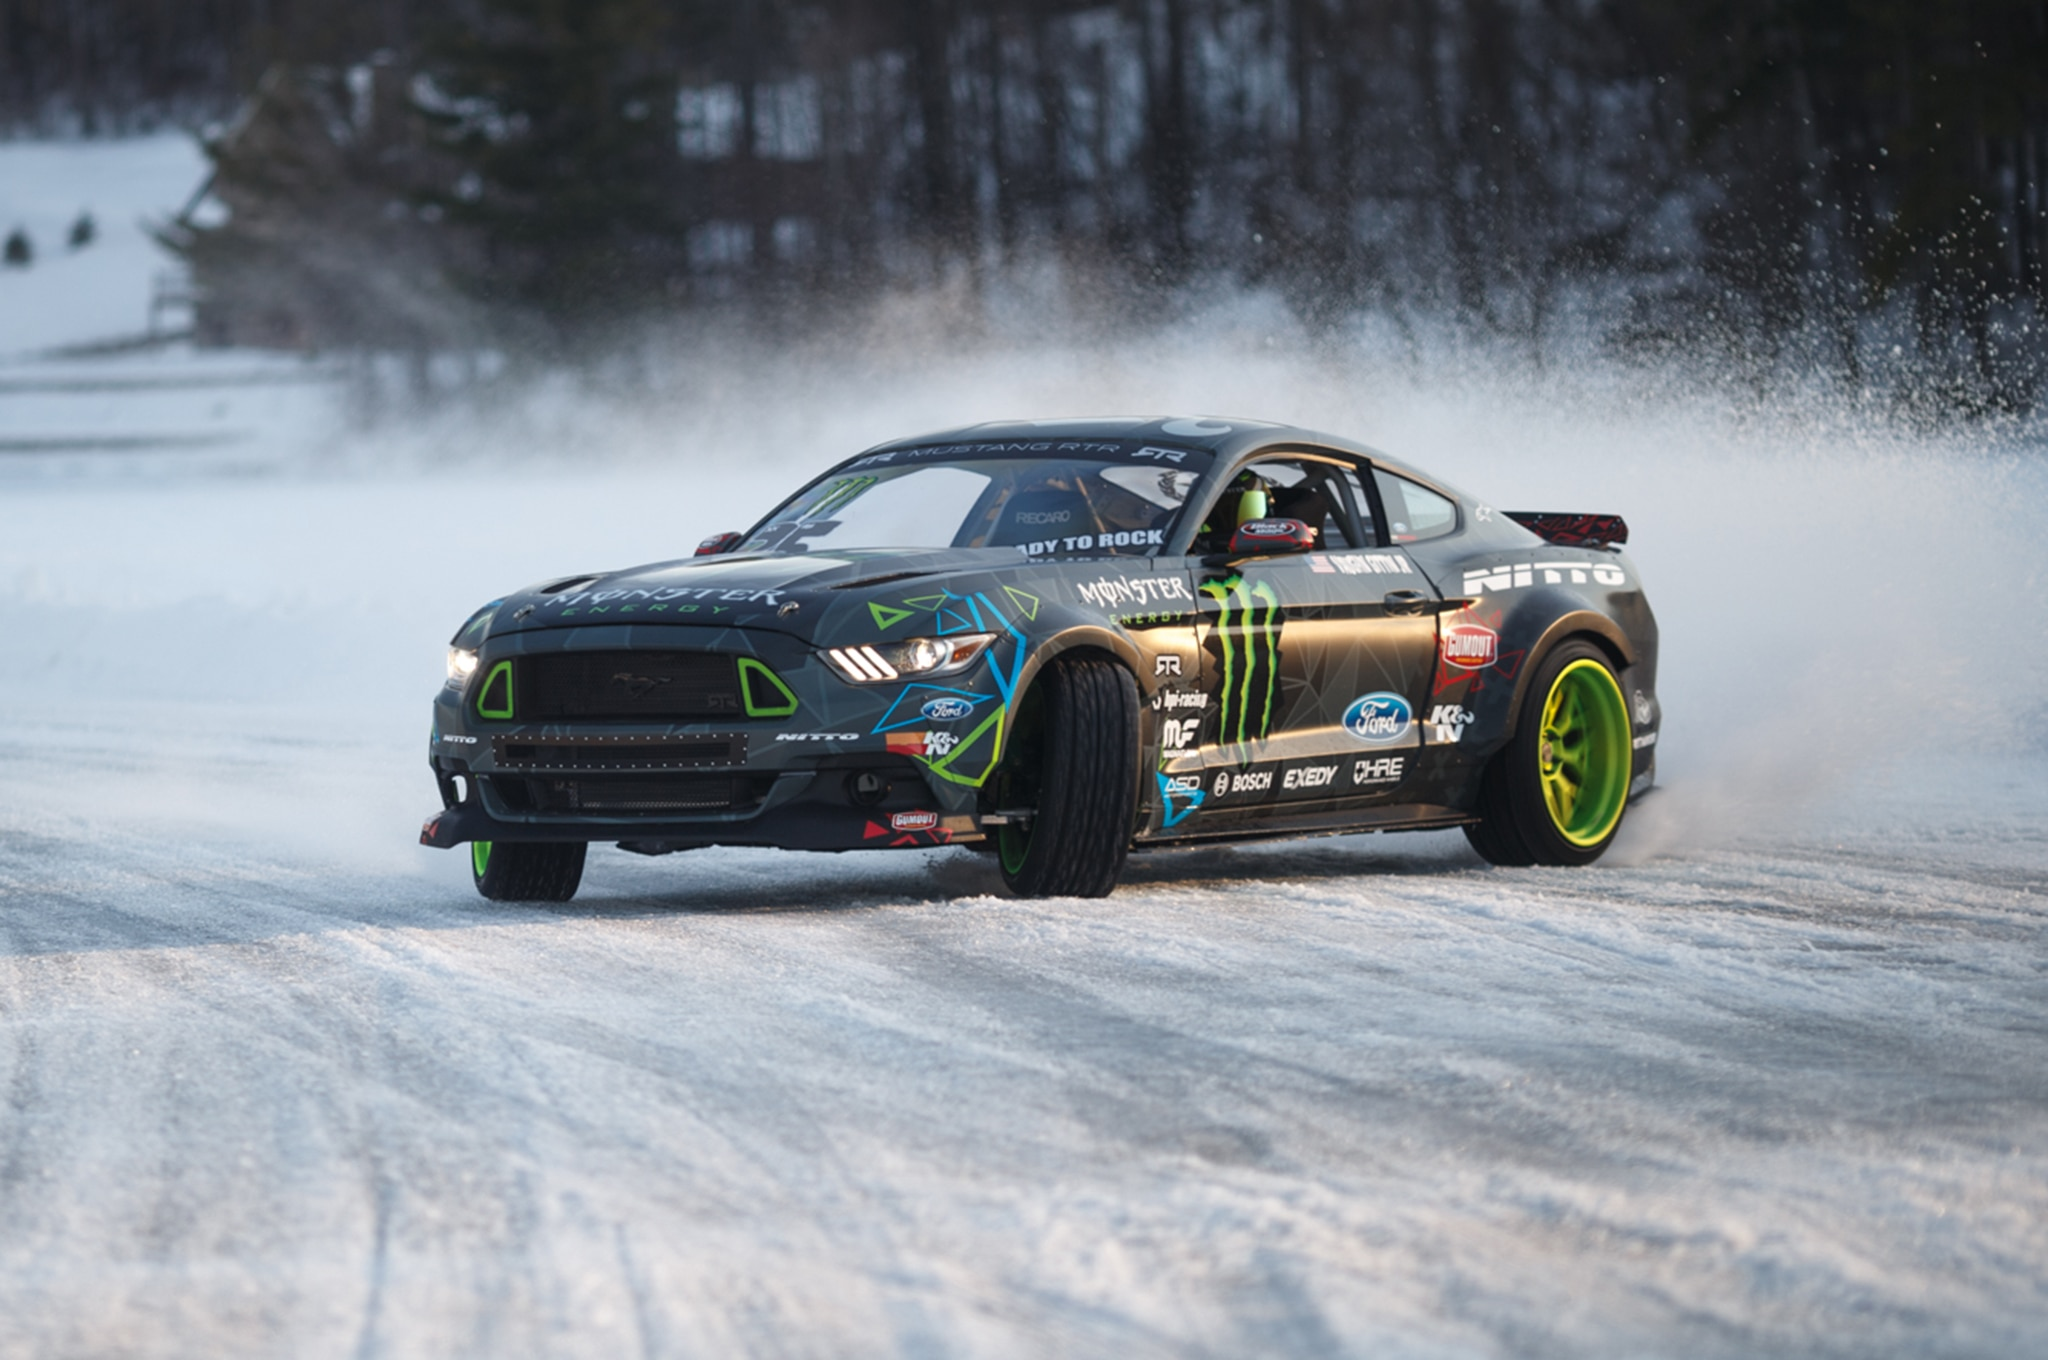 Watch Vaughn Gittin Jr Drift His Ford Mustang Rtr On Ice